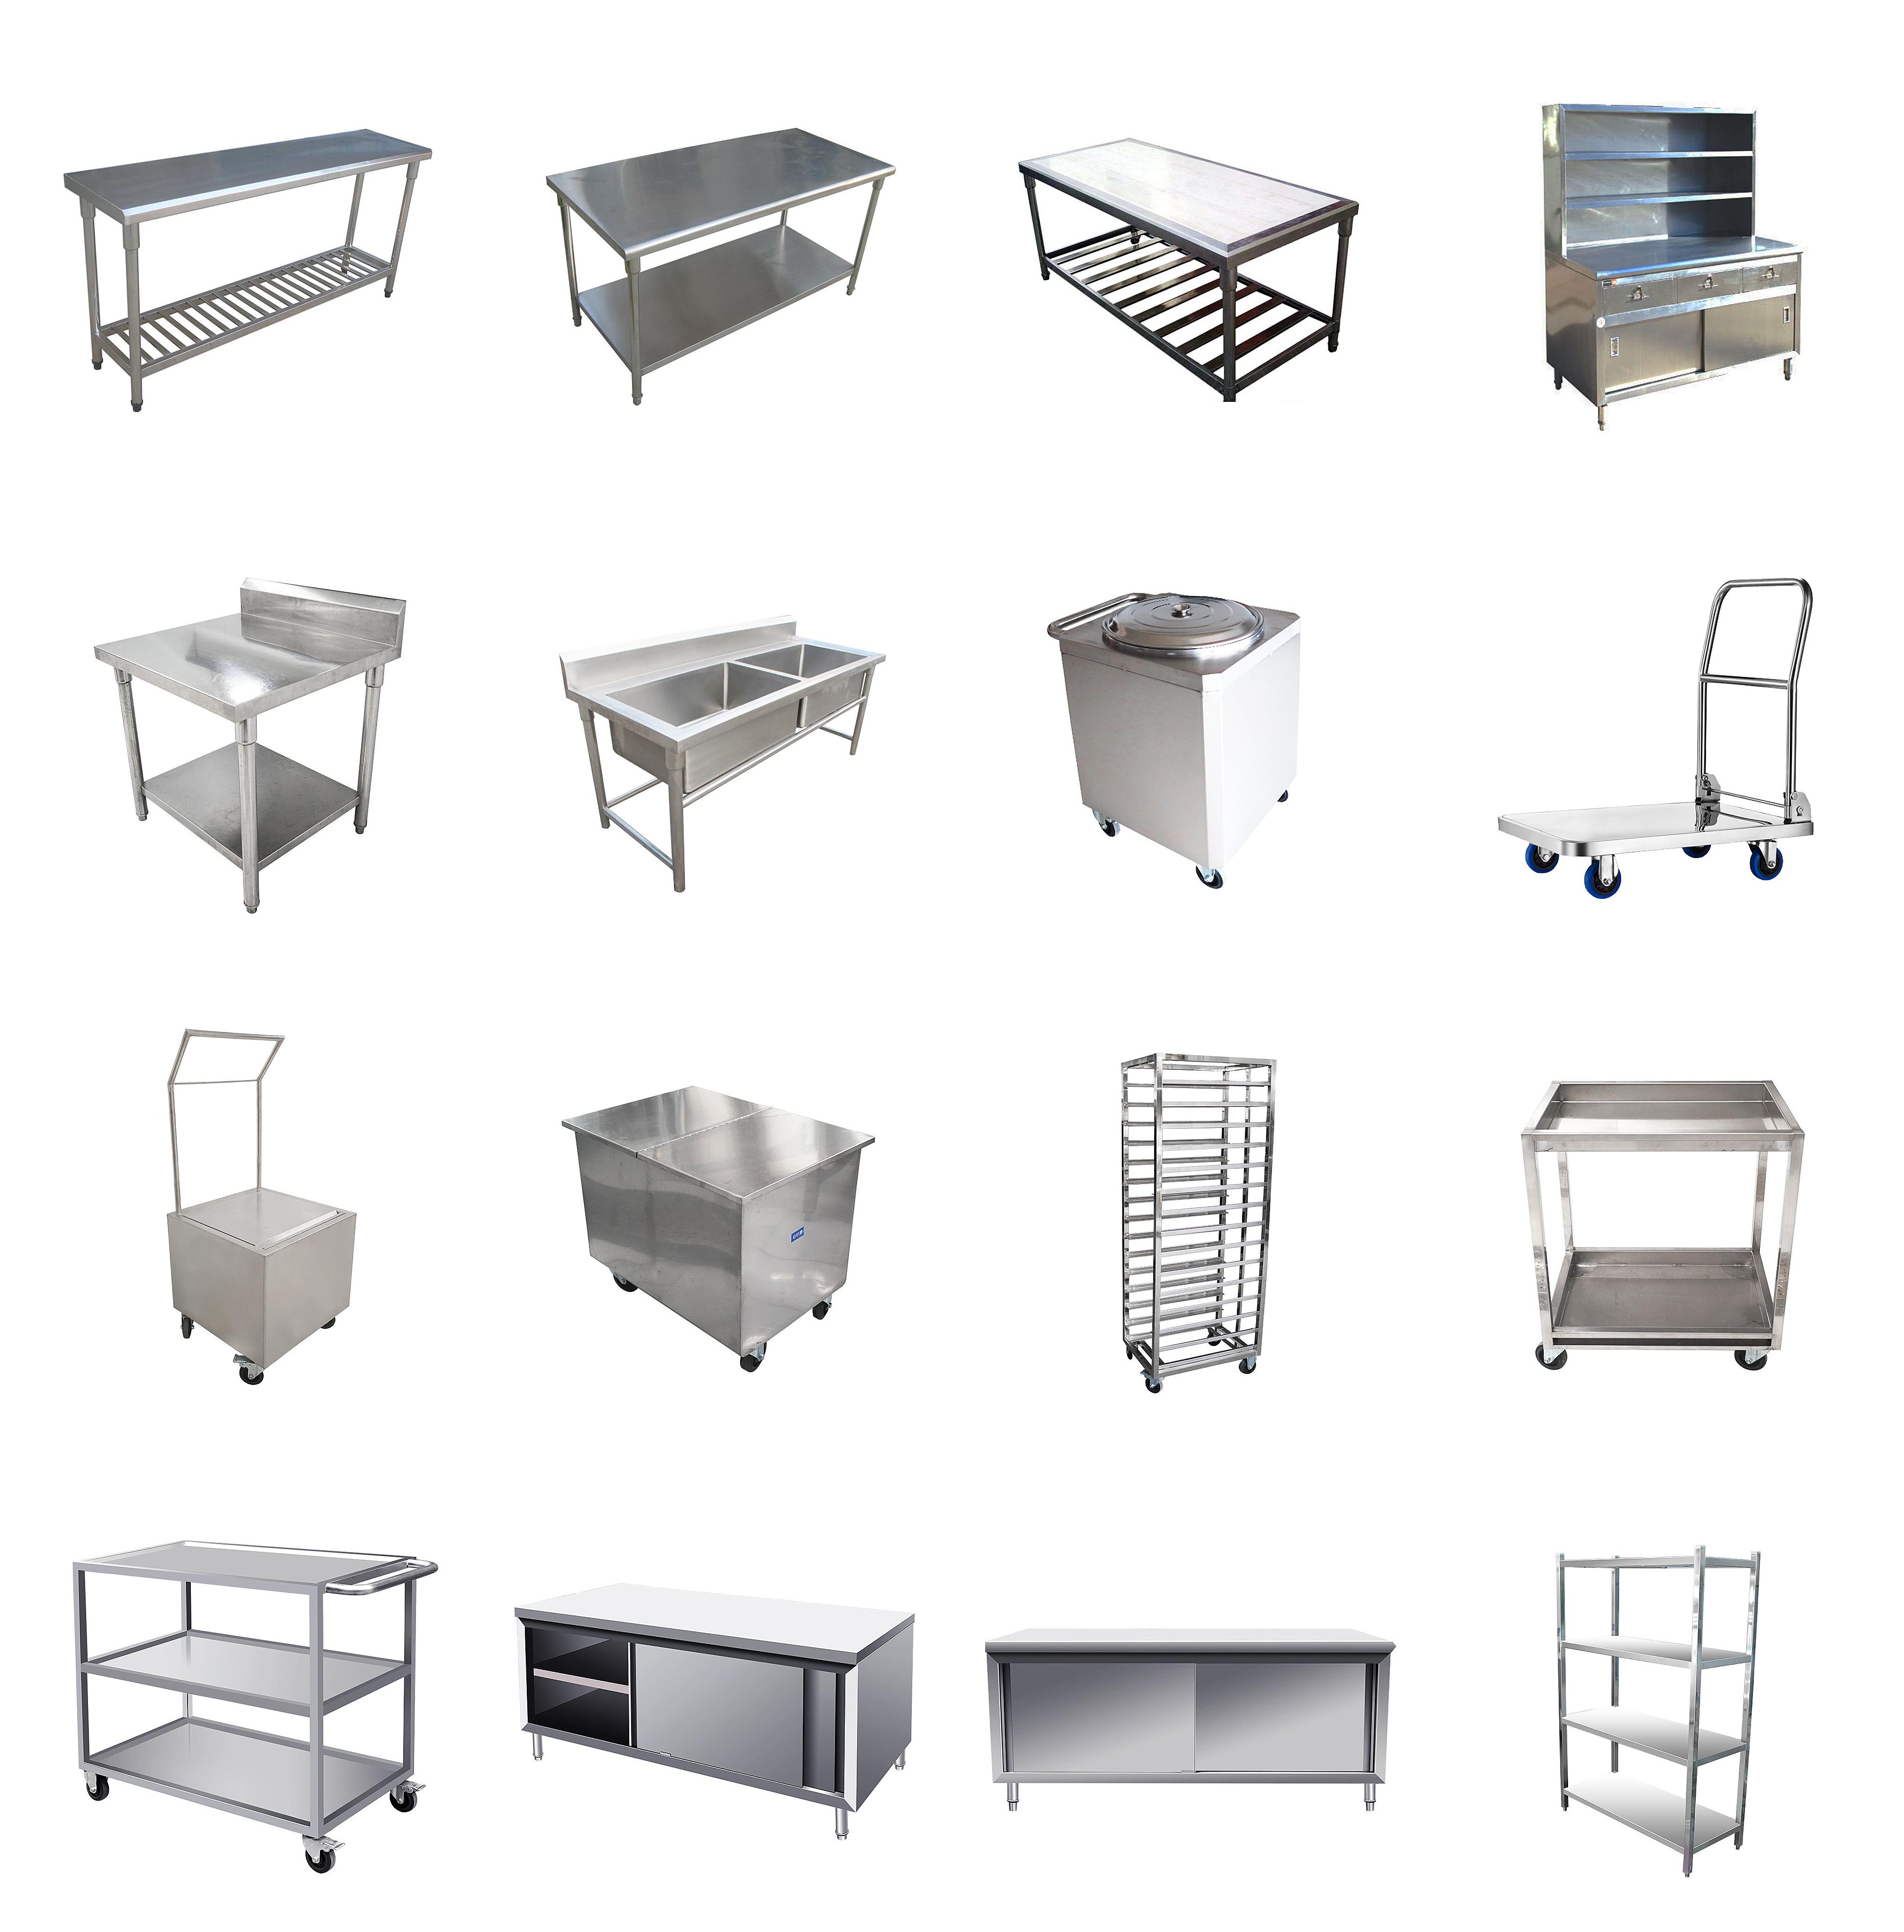 Kitchen Furniture List Gallery @house2homegoods.net